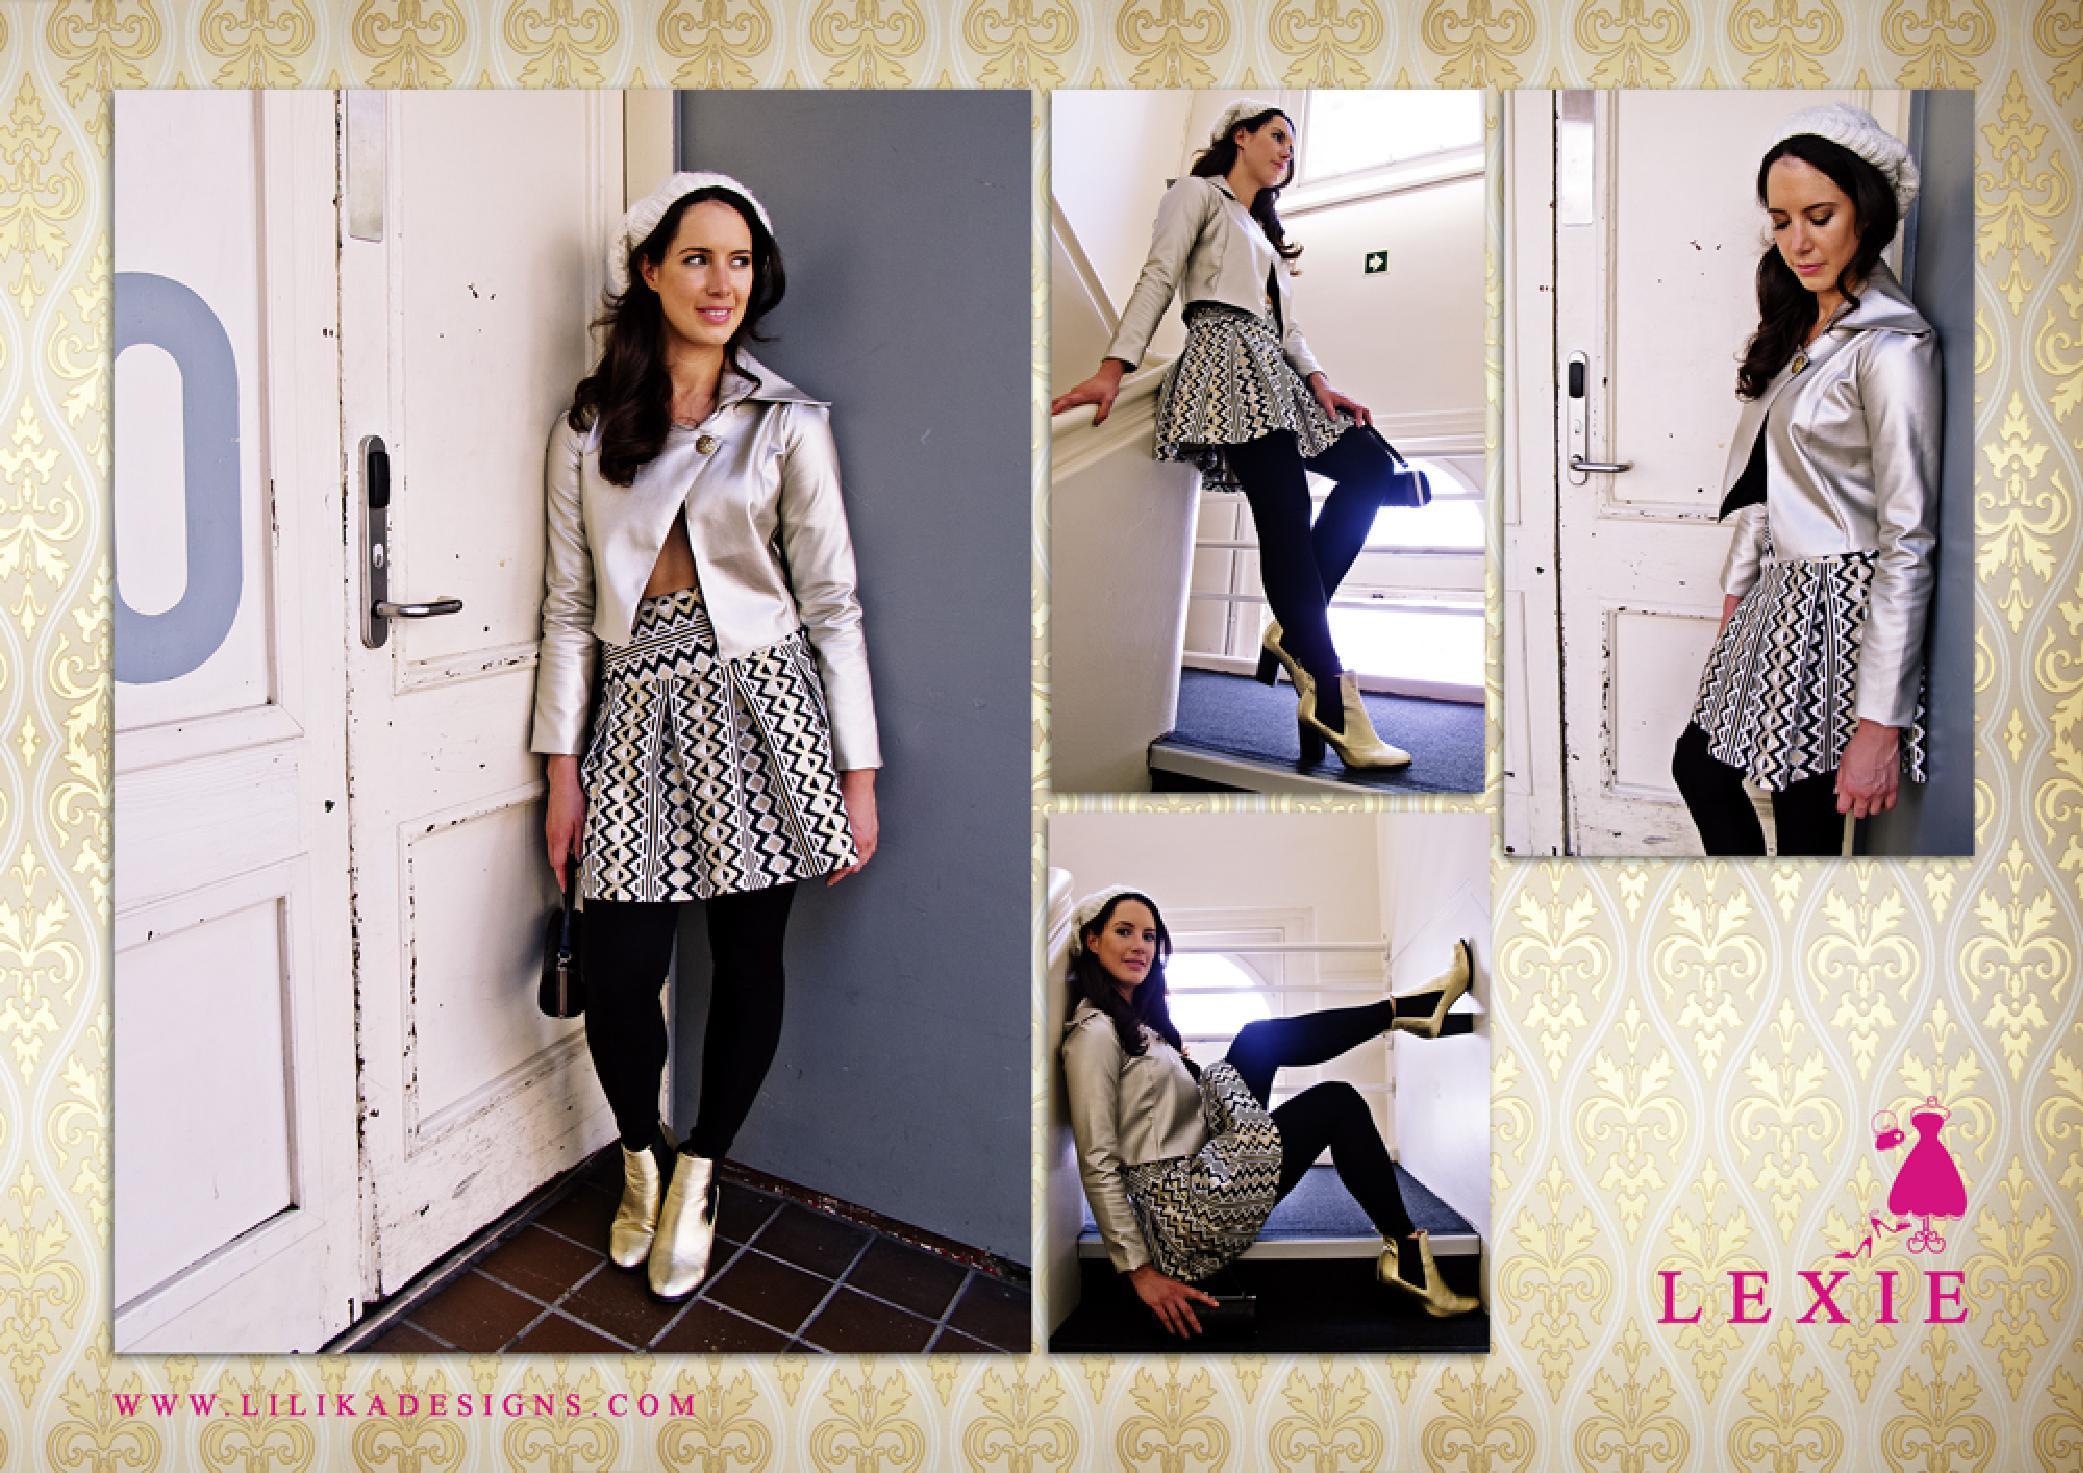 Lilika Designs Fashion House FWM Look Book 2017(Digital )-page-011